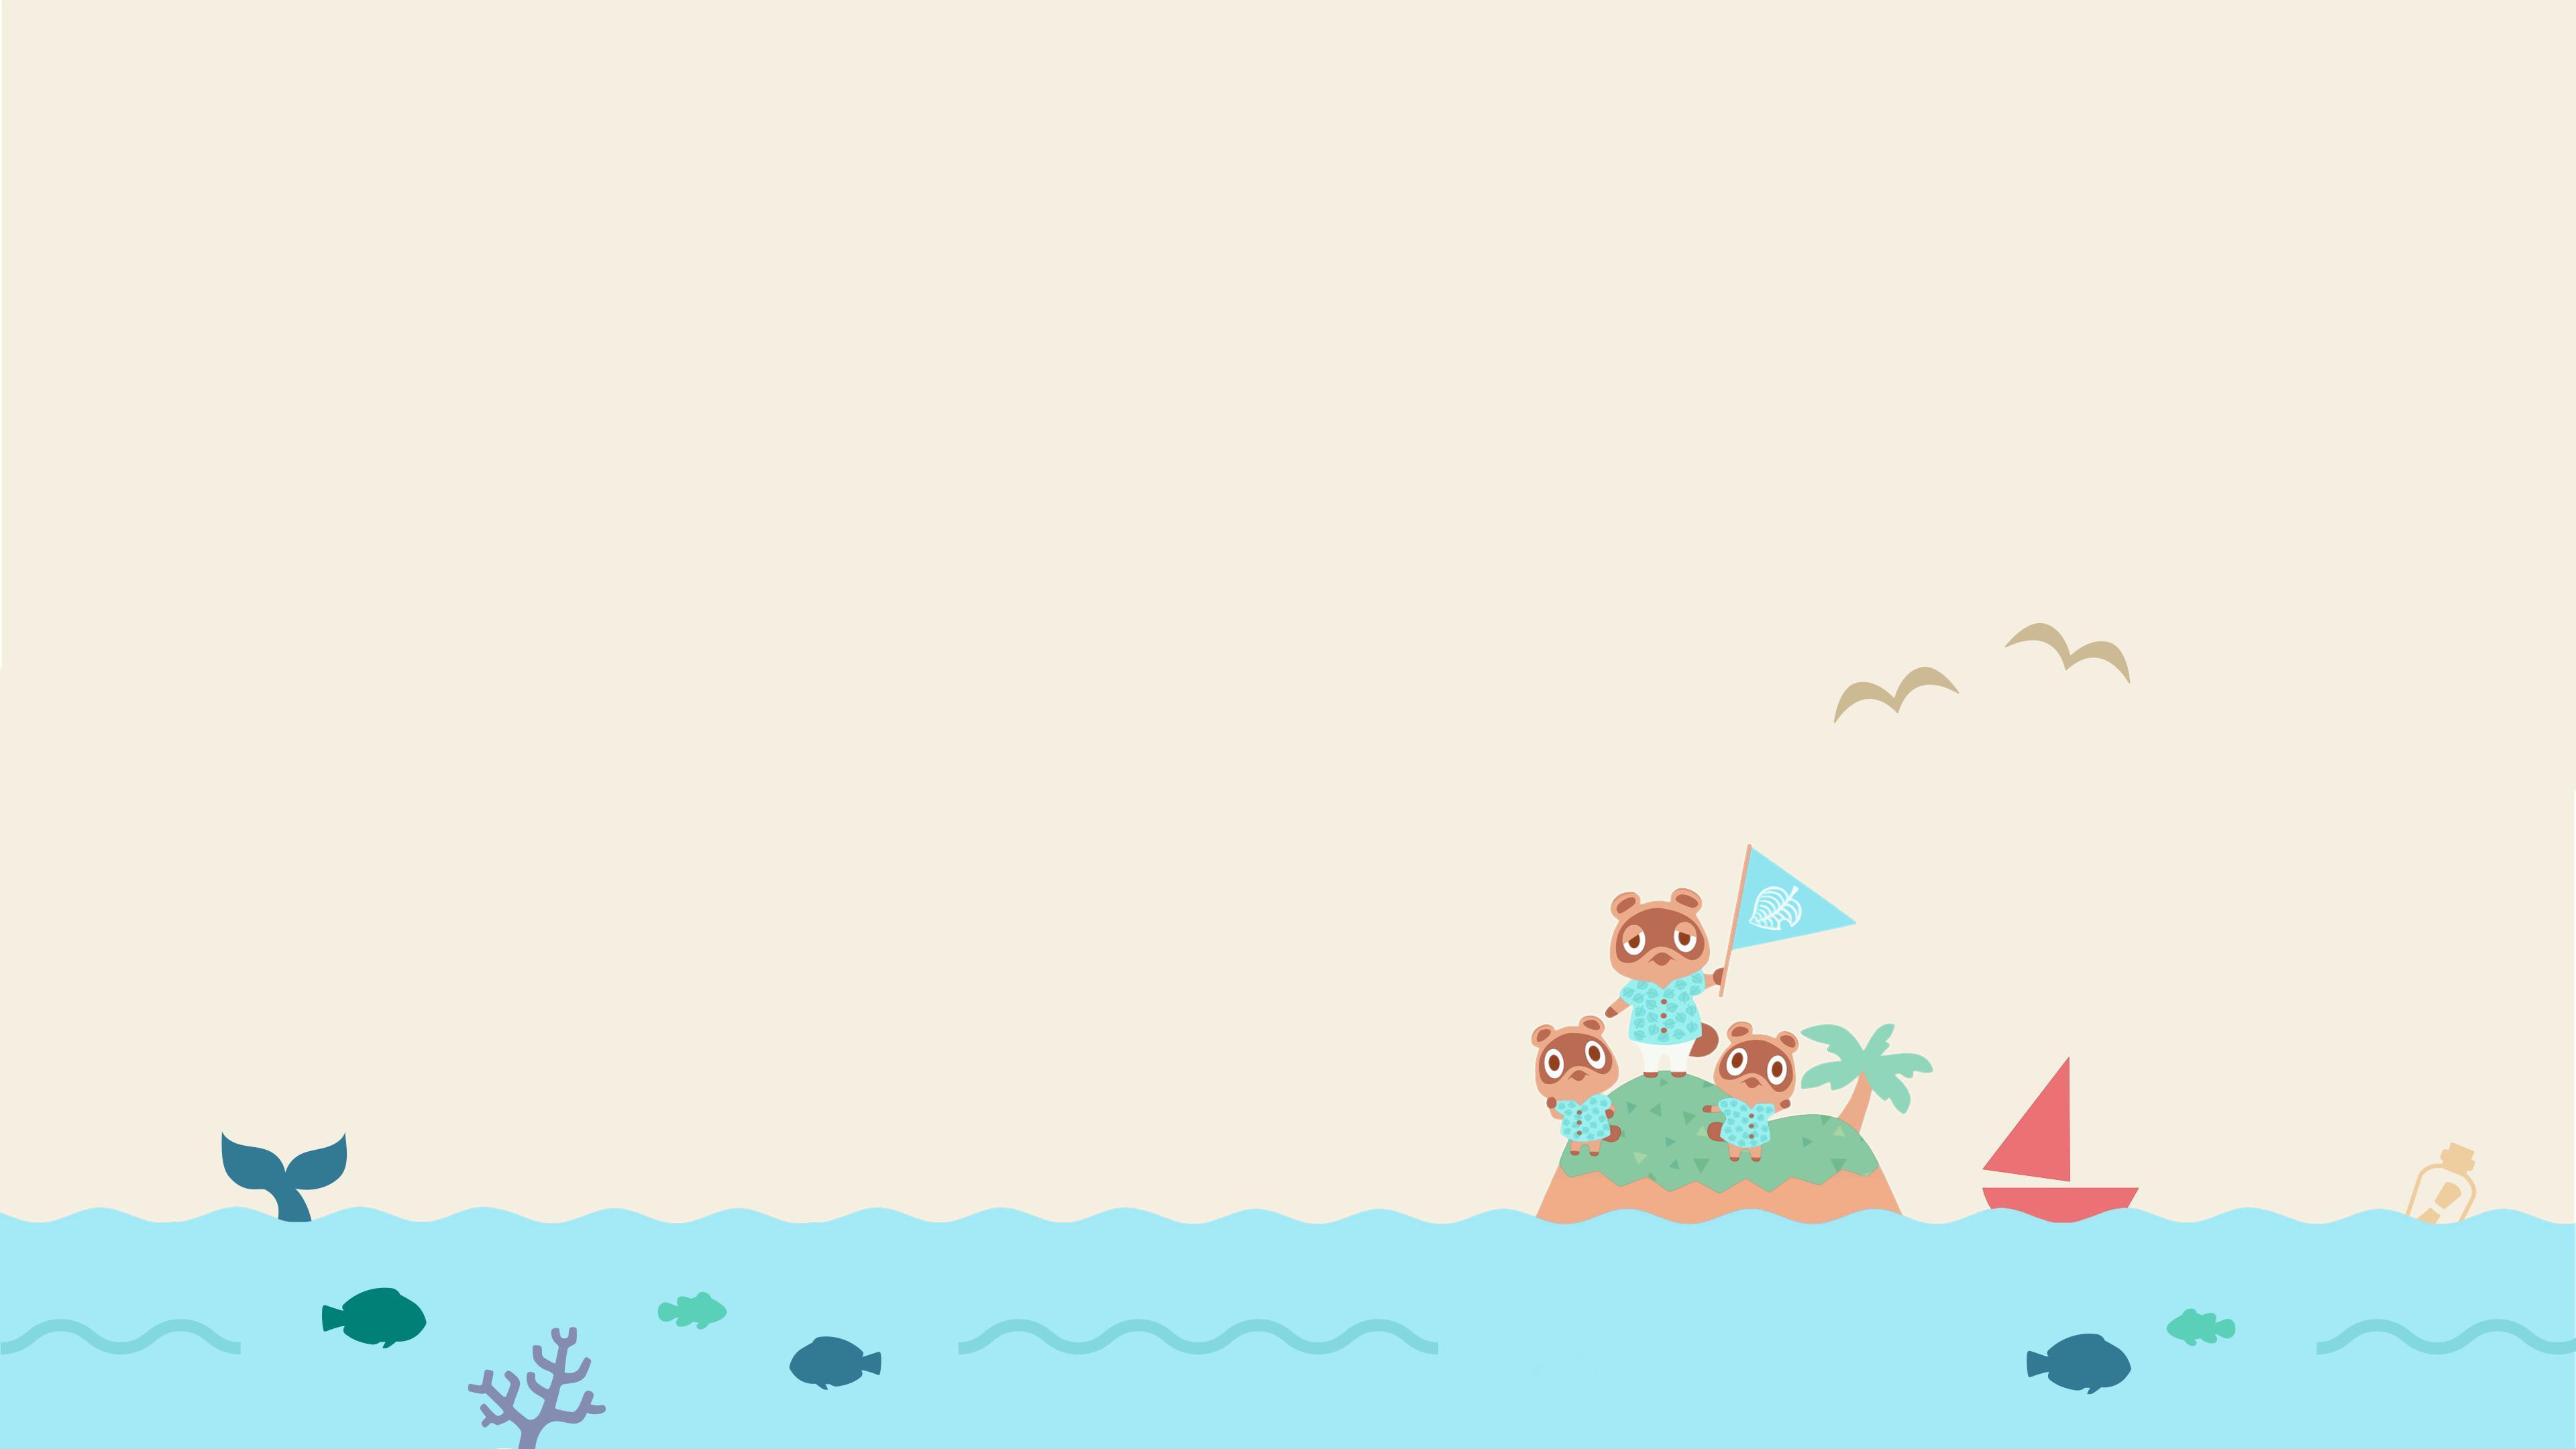 Animal Crossing Desktop Wallpapers - Wallpaper Cave